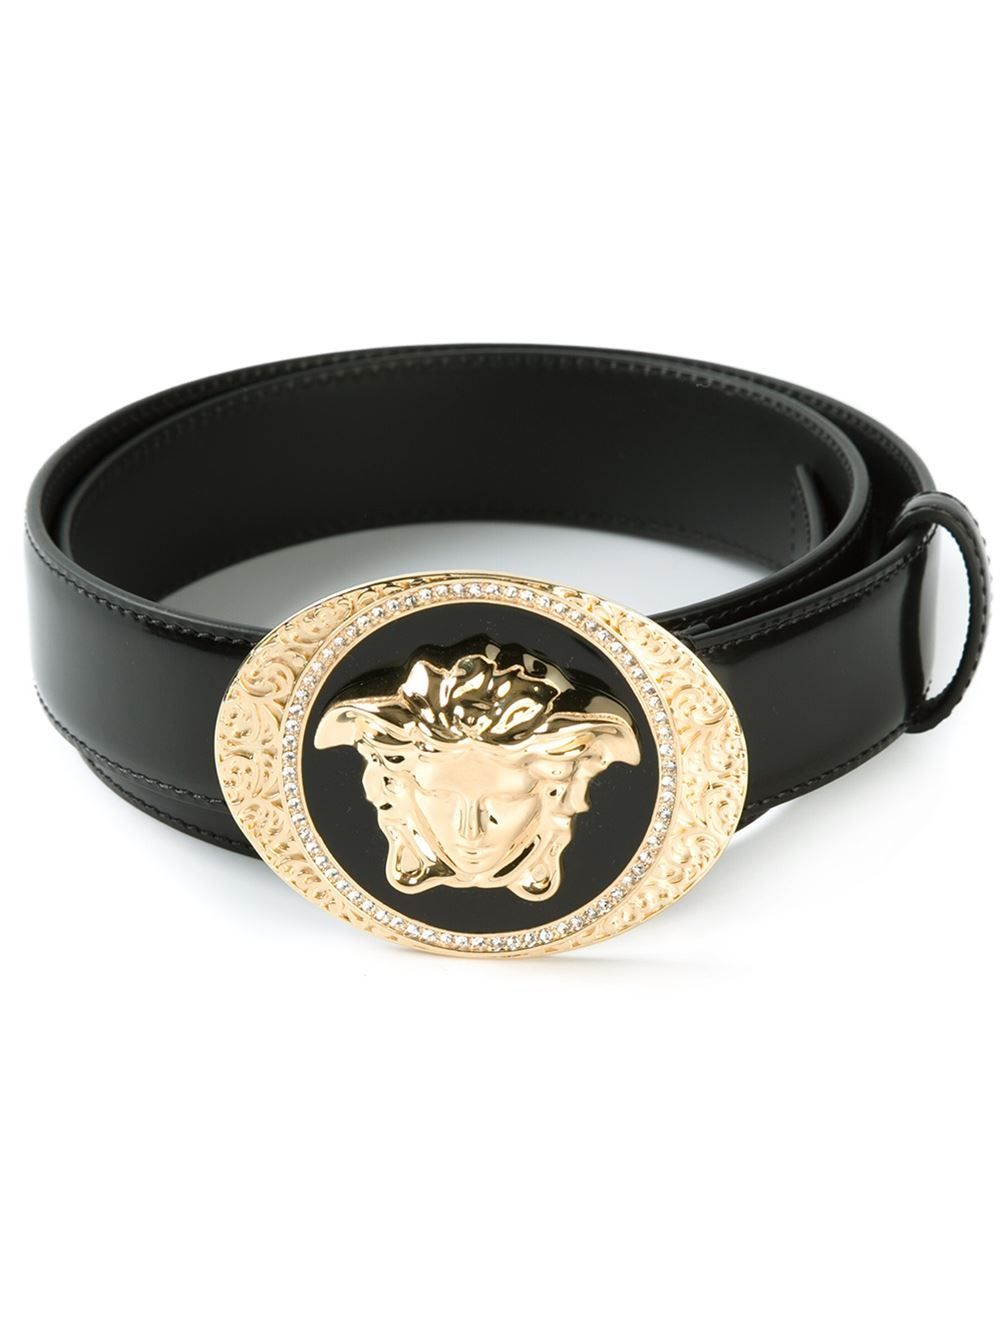 Medusa buckle belt - Black Versace xKdhgVq